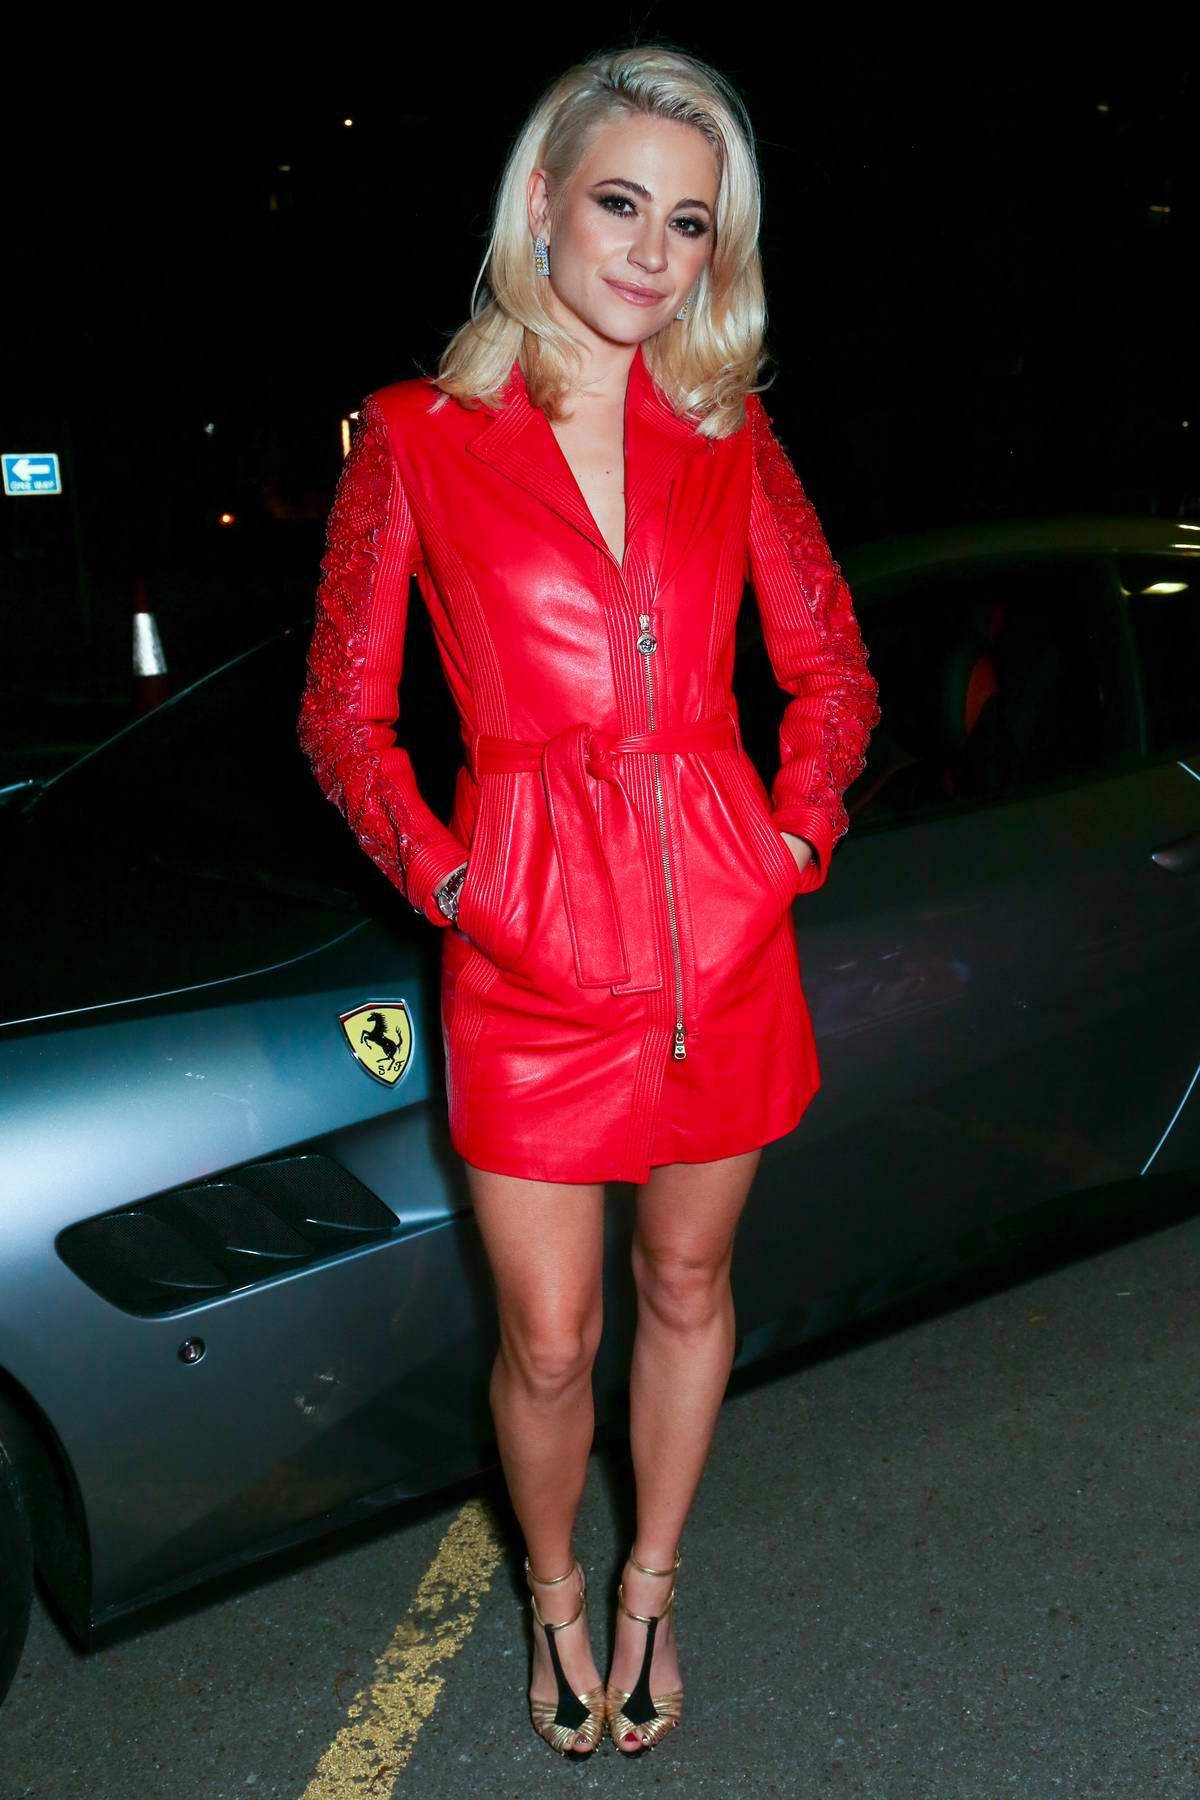 Pixie Lott attending the UK launch for the new Ferrari Portofino at Kensington Olympia in London